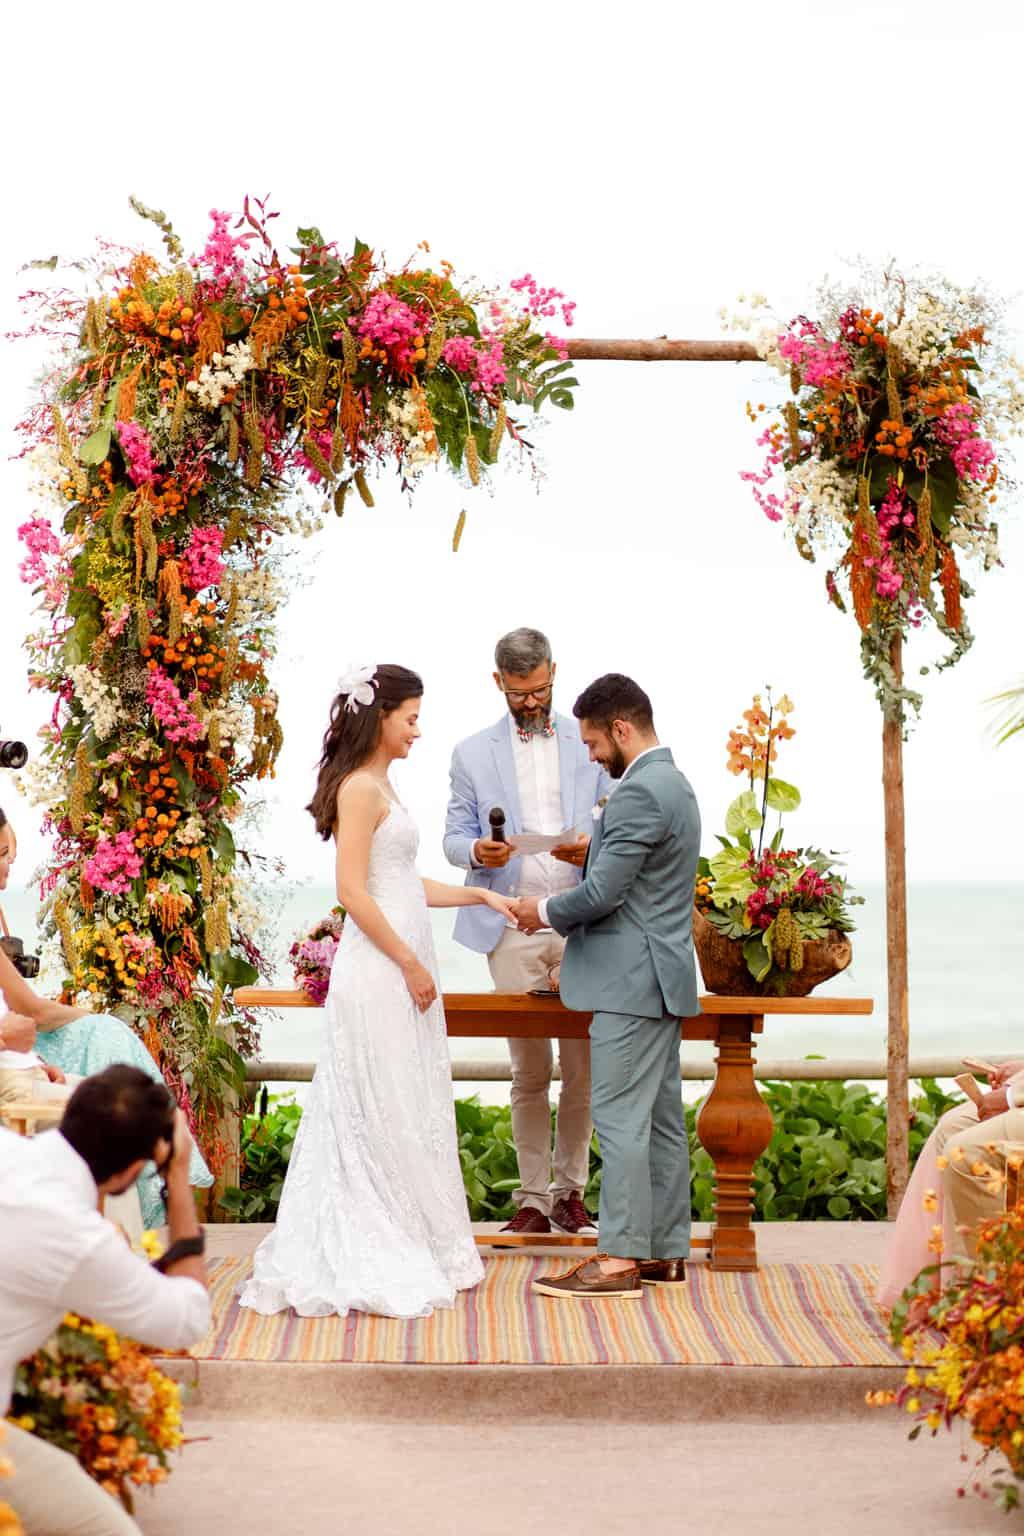 Casamento-Emanuelle-e-Alysson-Fotografia-Tadeu-Nanó-e-Luca-Antunes105